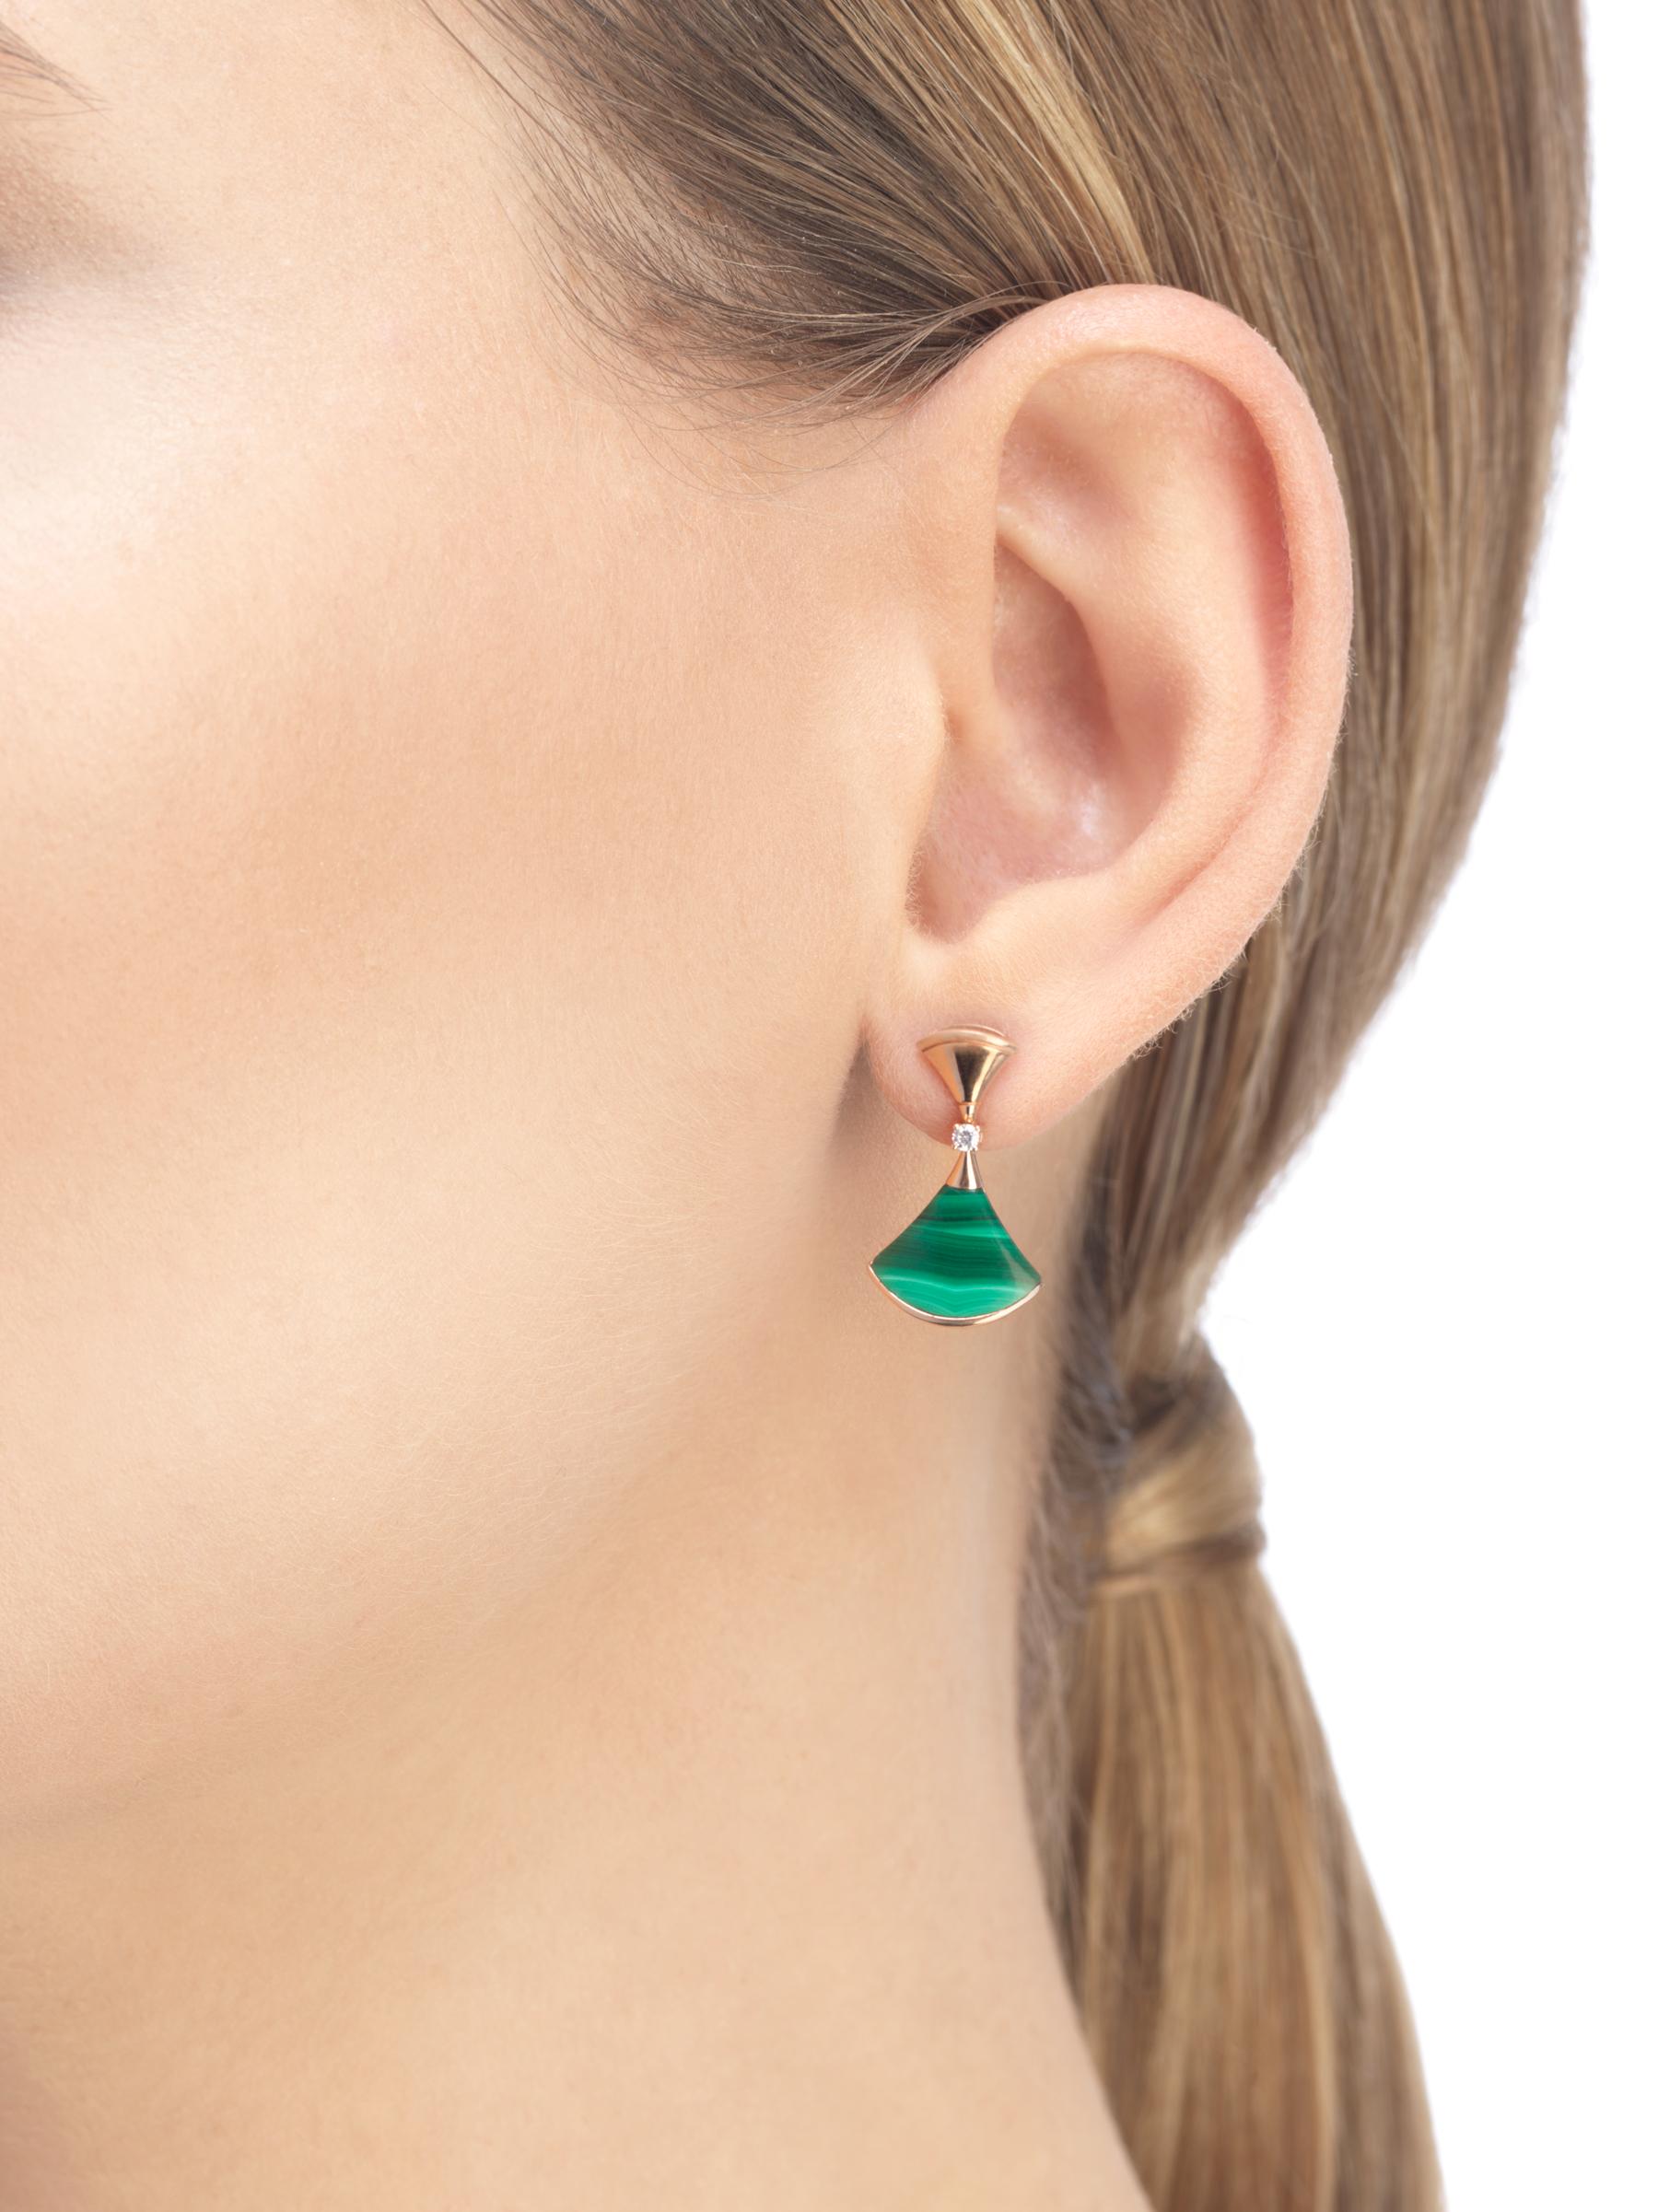 DIVAS' DREAM 18 kt rose gold earring set with malachite elements and round brilliant-cut diamonds (0.07 ct) 356454 image 3